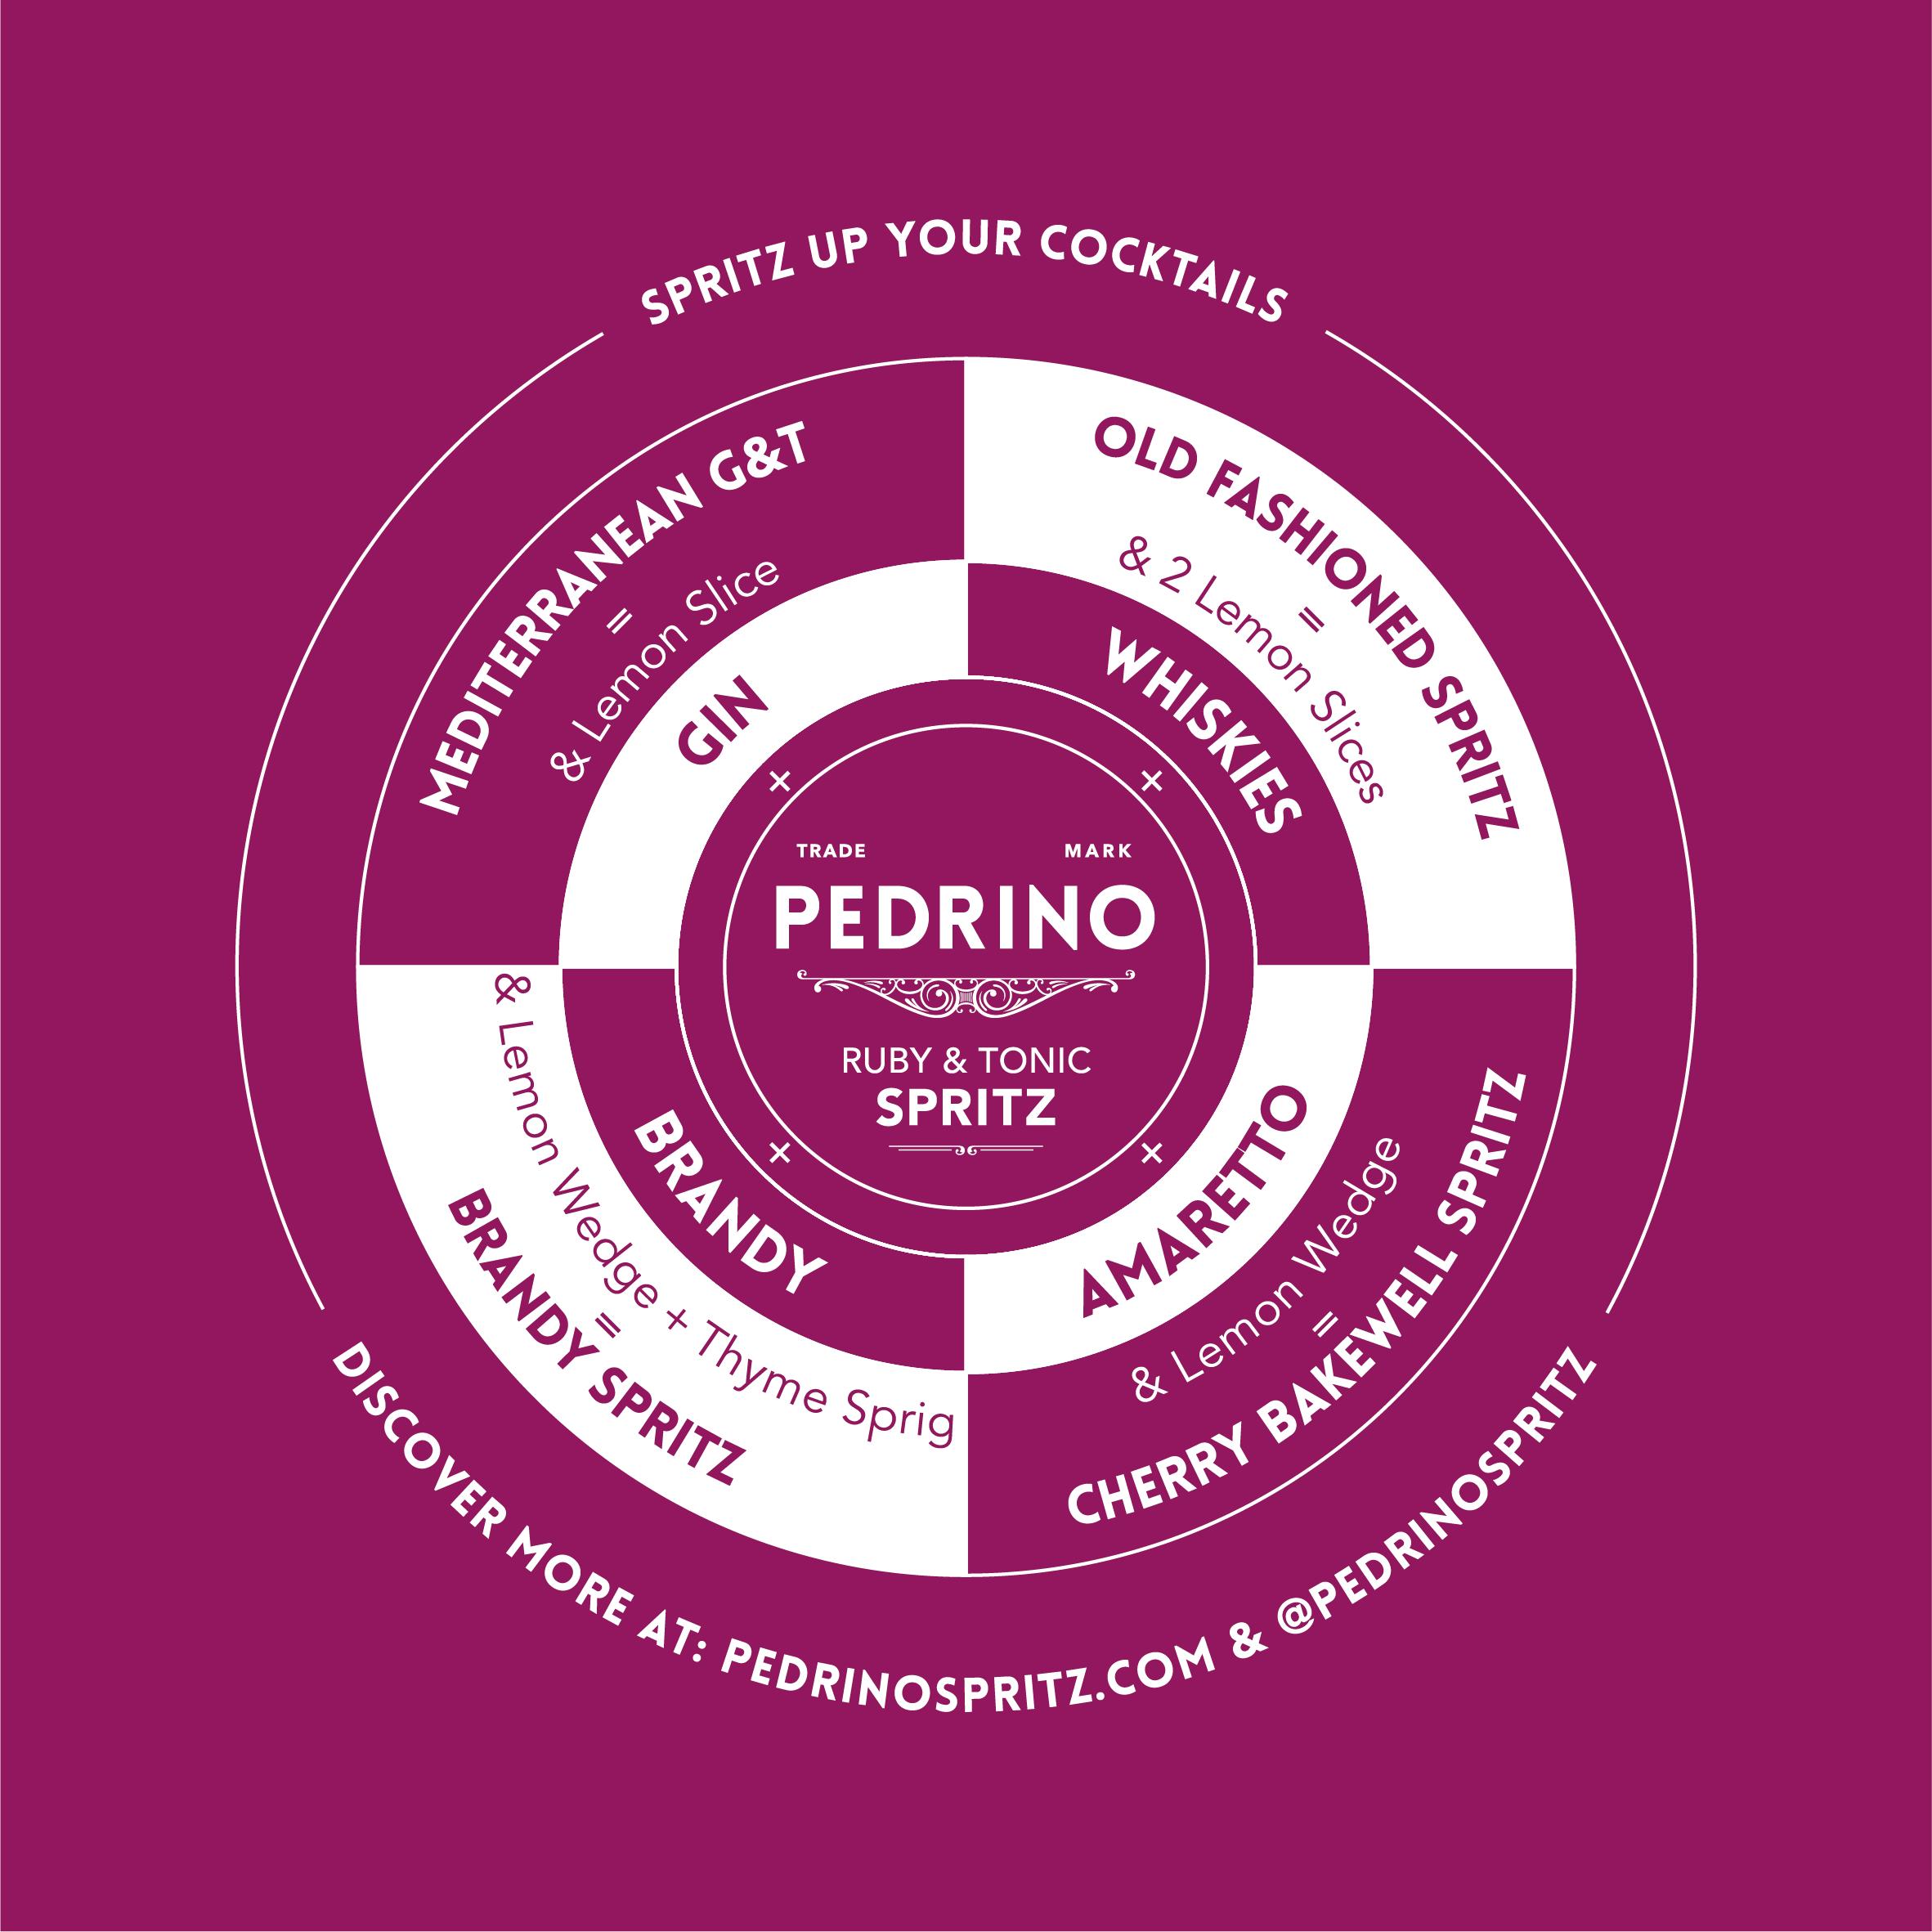 Pedrino Ruby & Tonic Spritz. Pairing Wheel